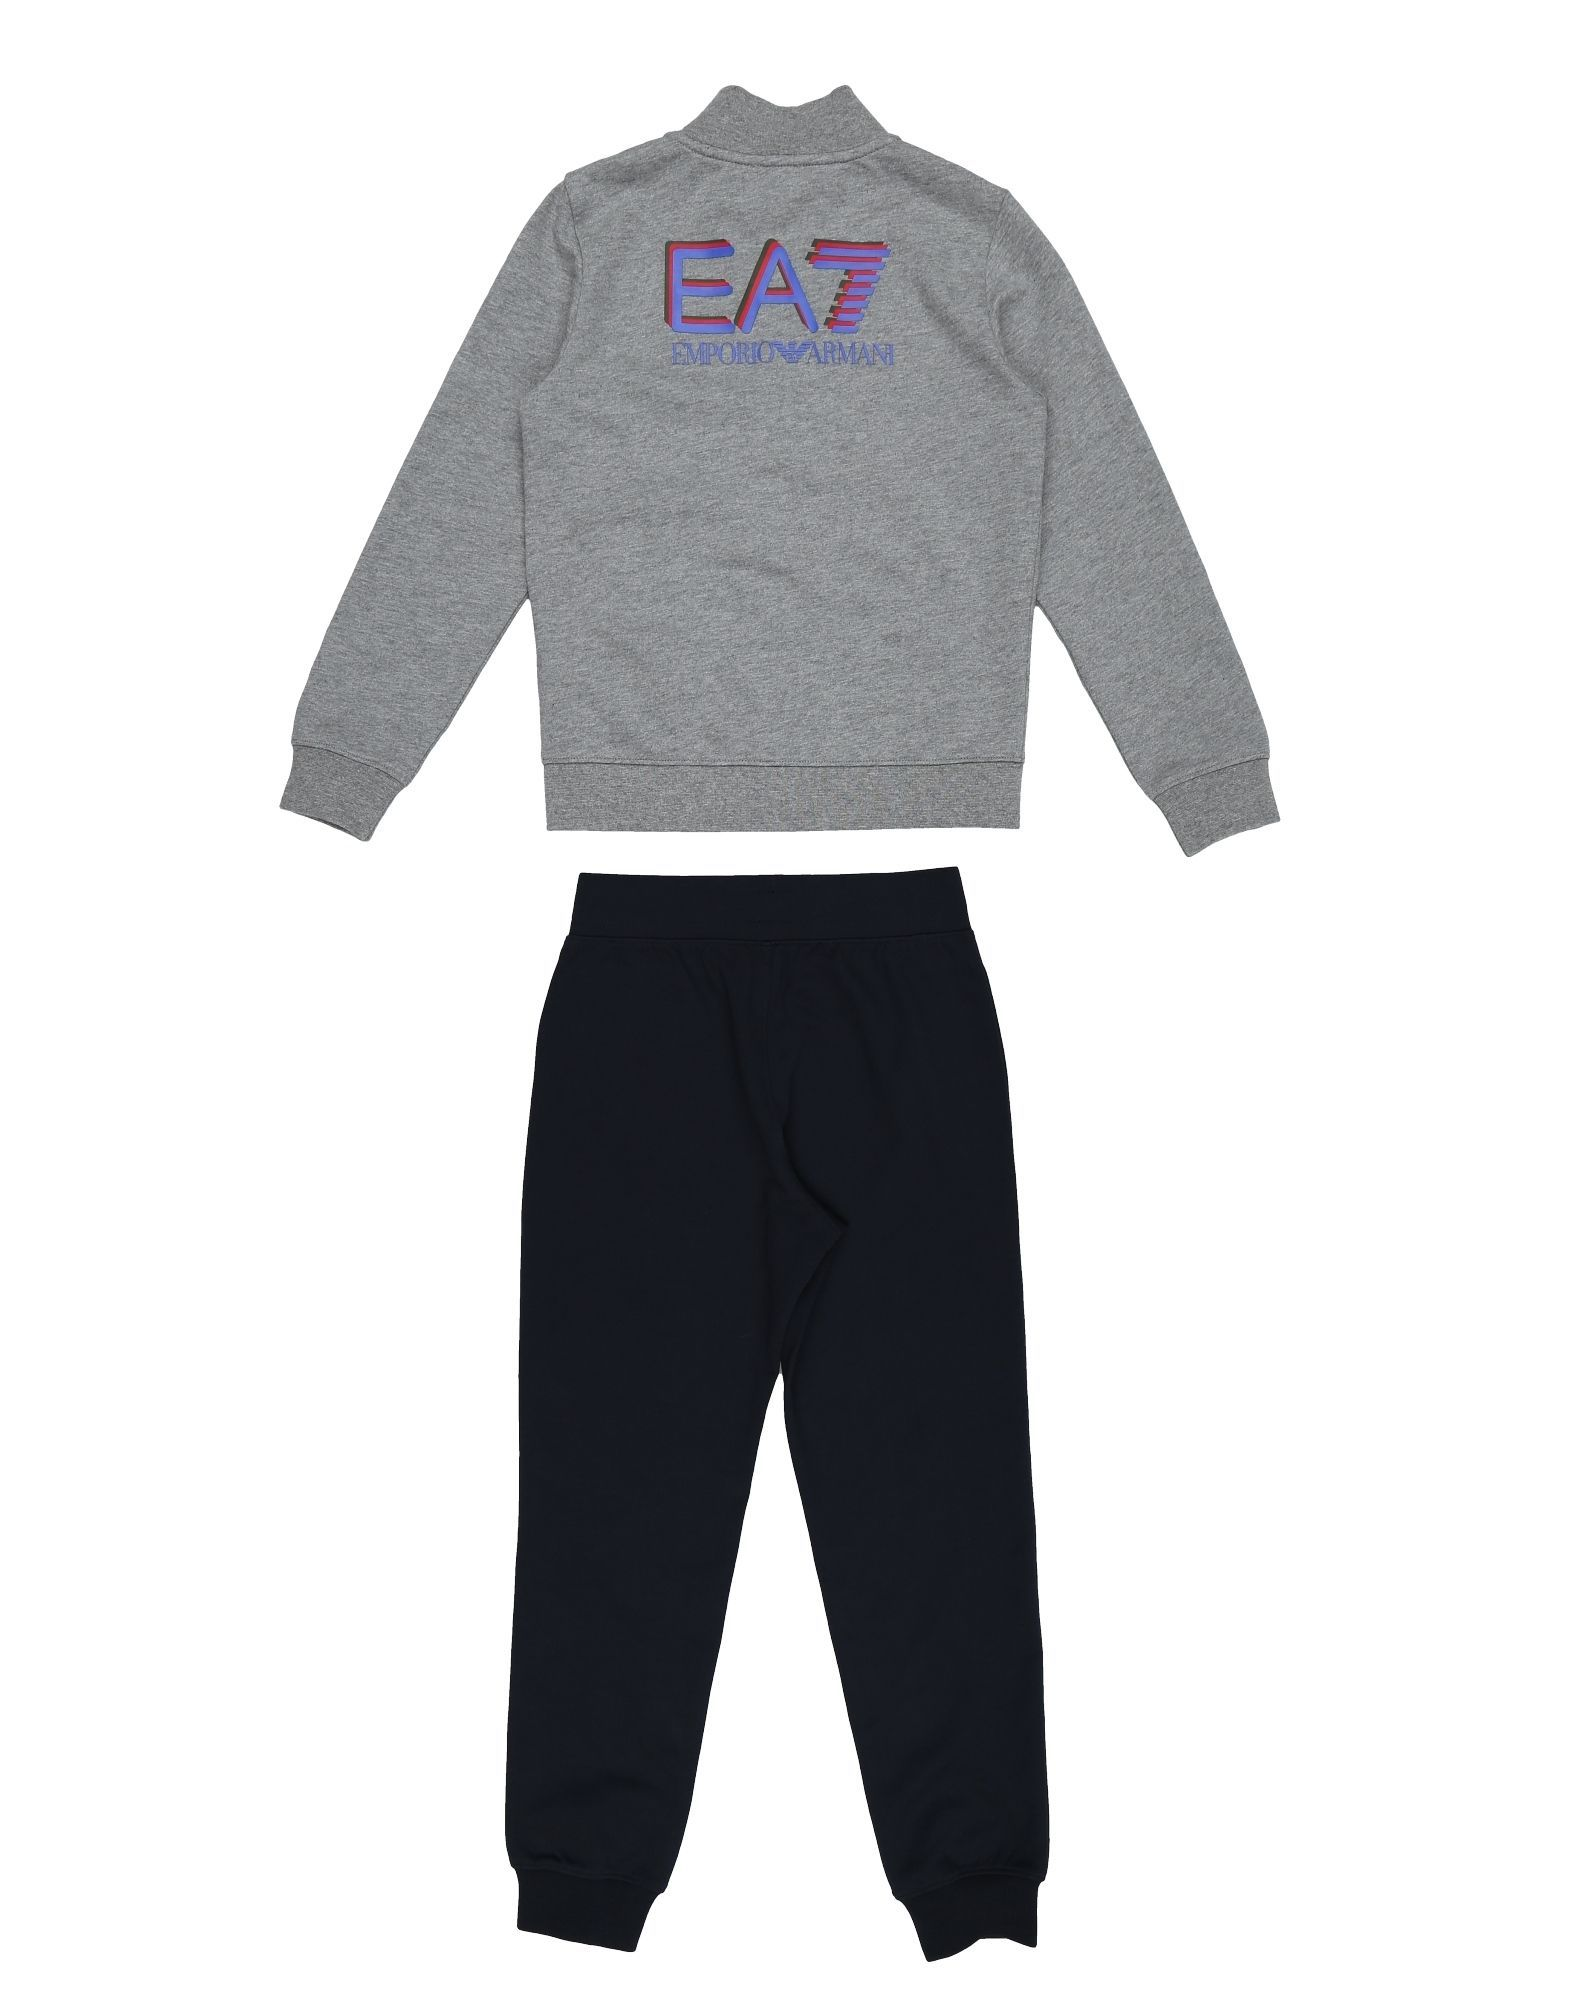 EA7 Grey Cotton Sweatshirt And Joggers Set